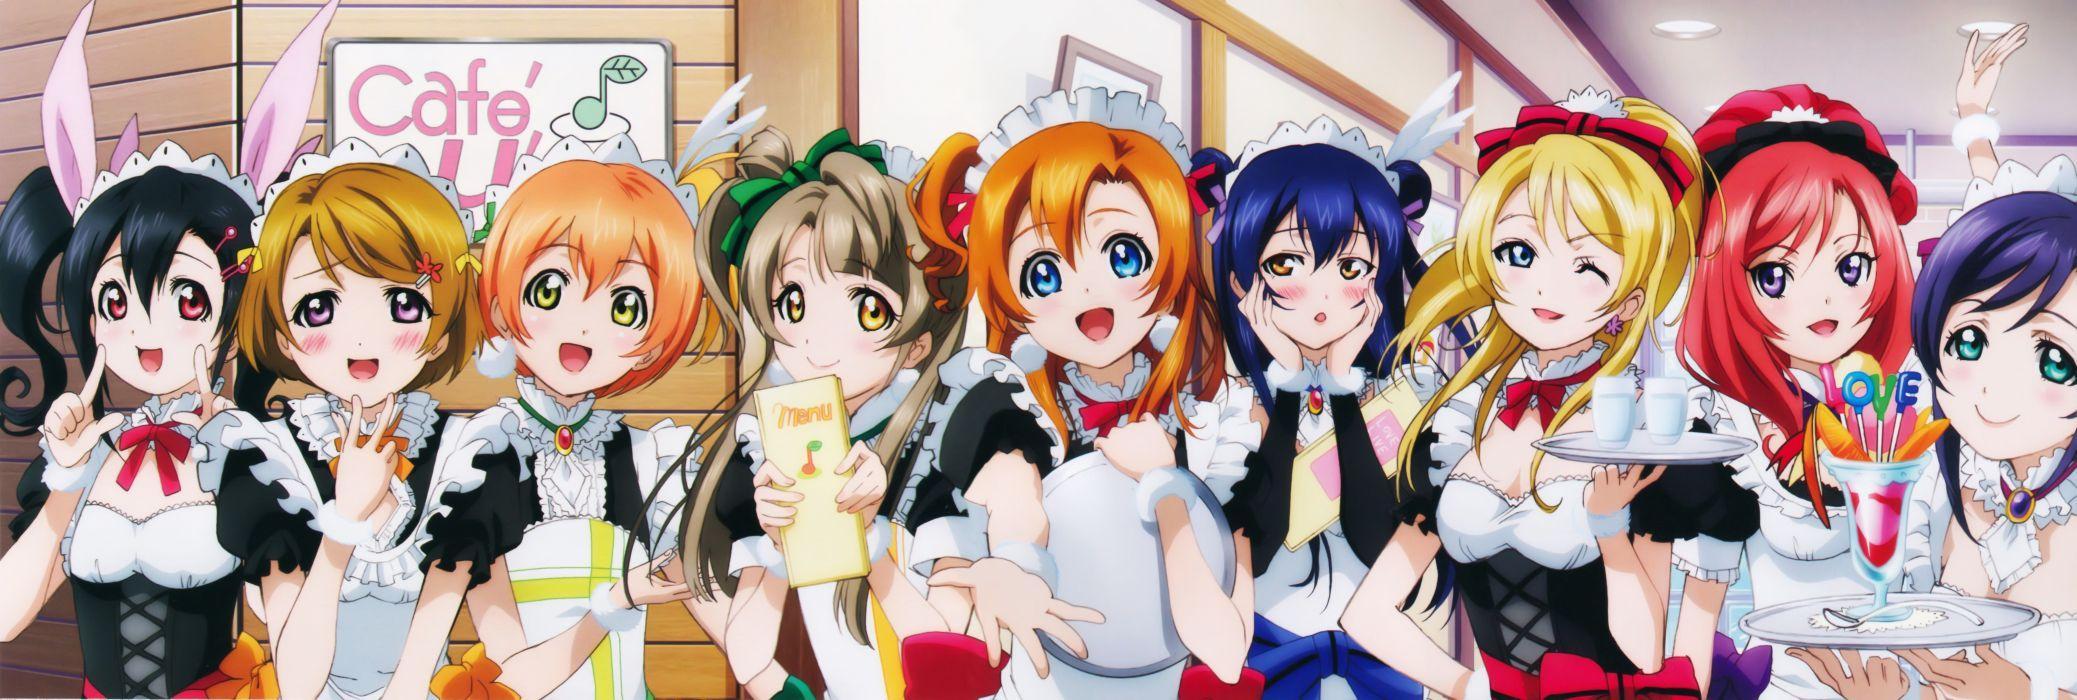 love live! maid ayase eli hoshizora rin koizumi hanayo kousaka honoka wallpaper